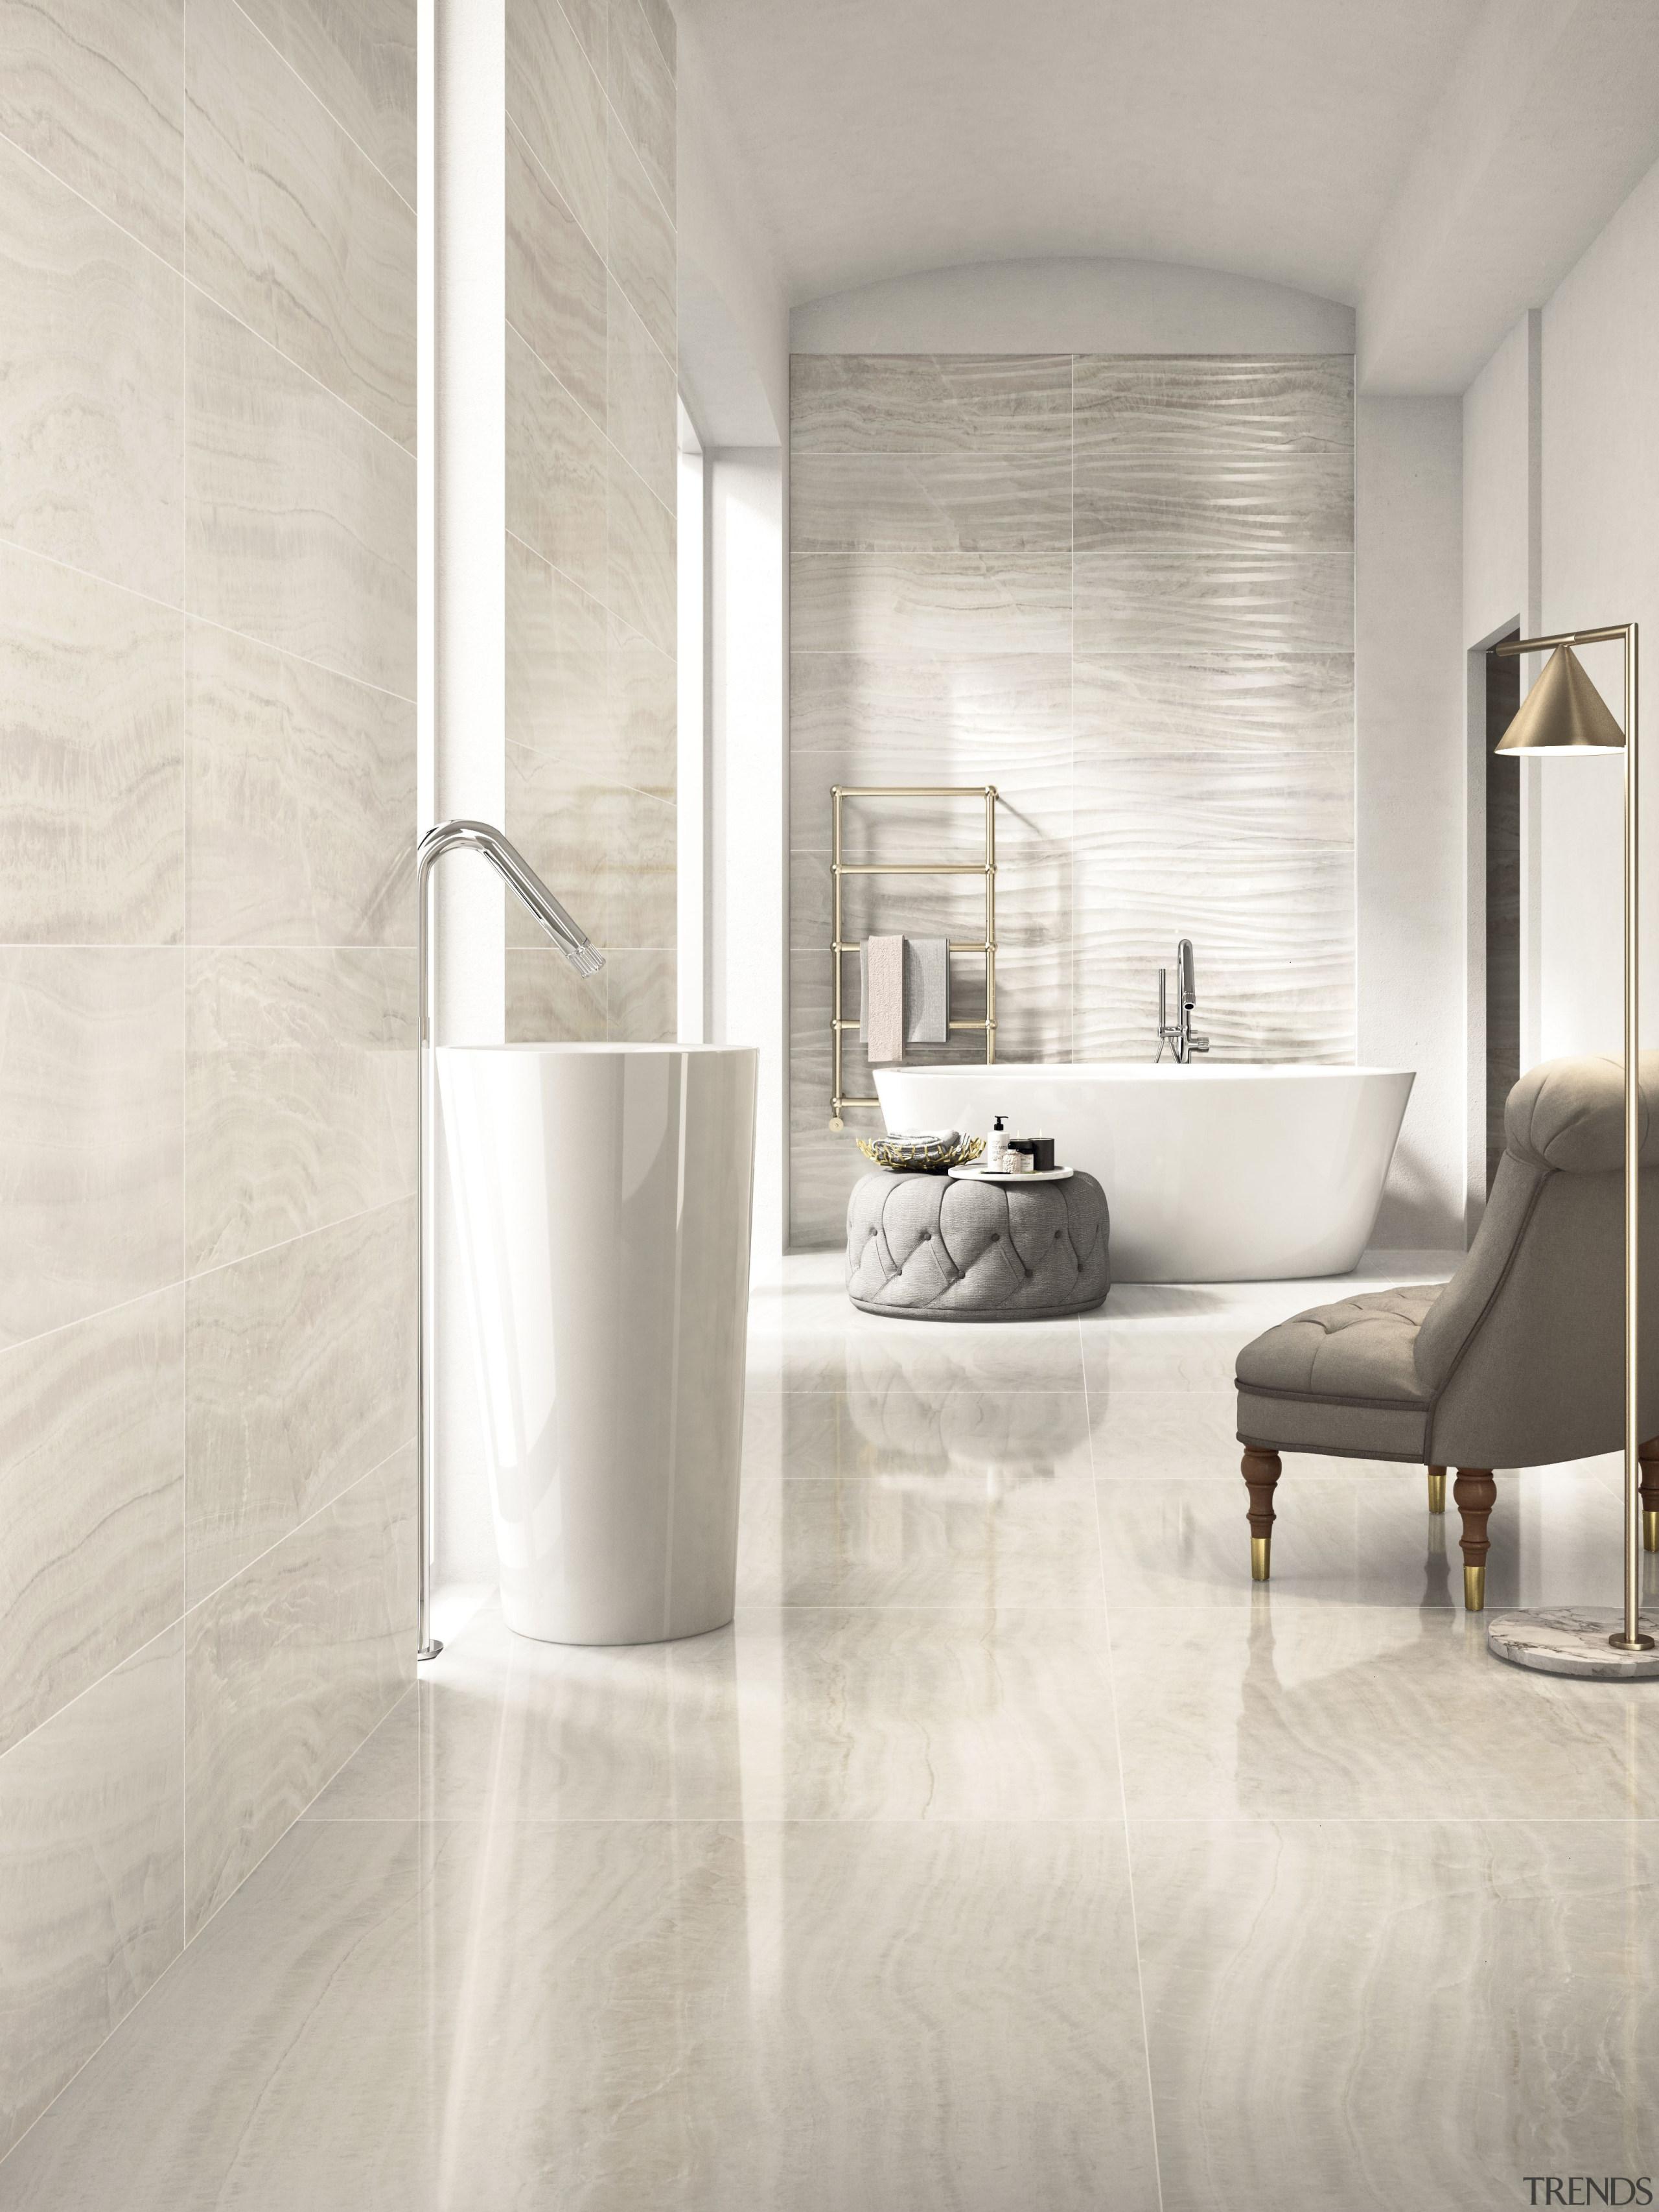 Trilogy Onyx - Trilogy Onyx - floor | floor, flooring, interior design, laminate flooring, tap, tile, wall, wood flooring, white